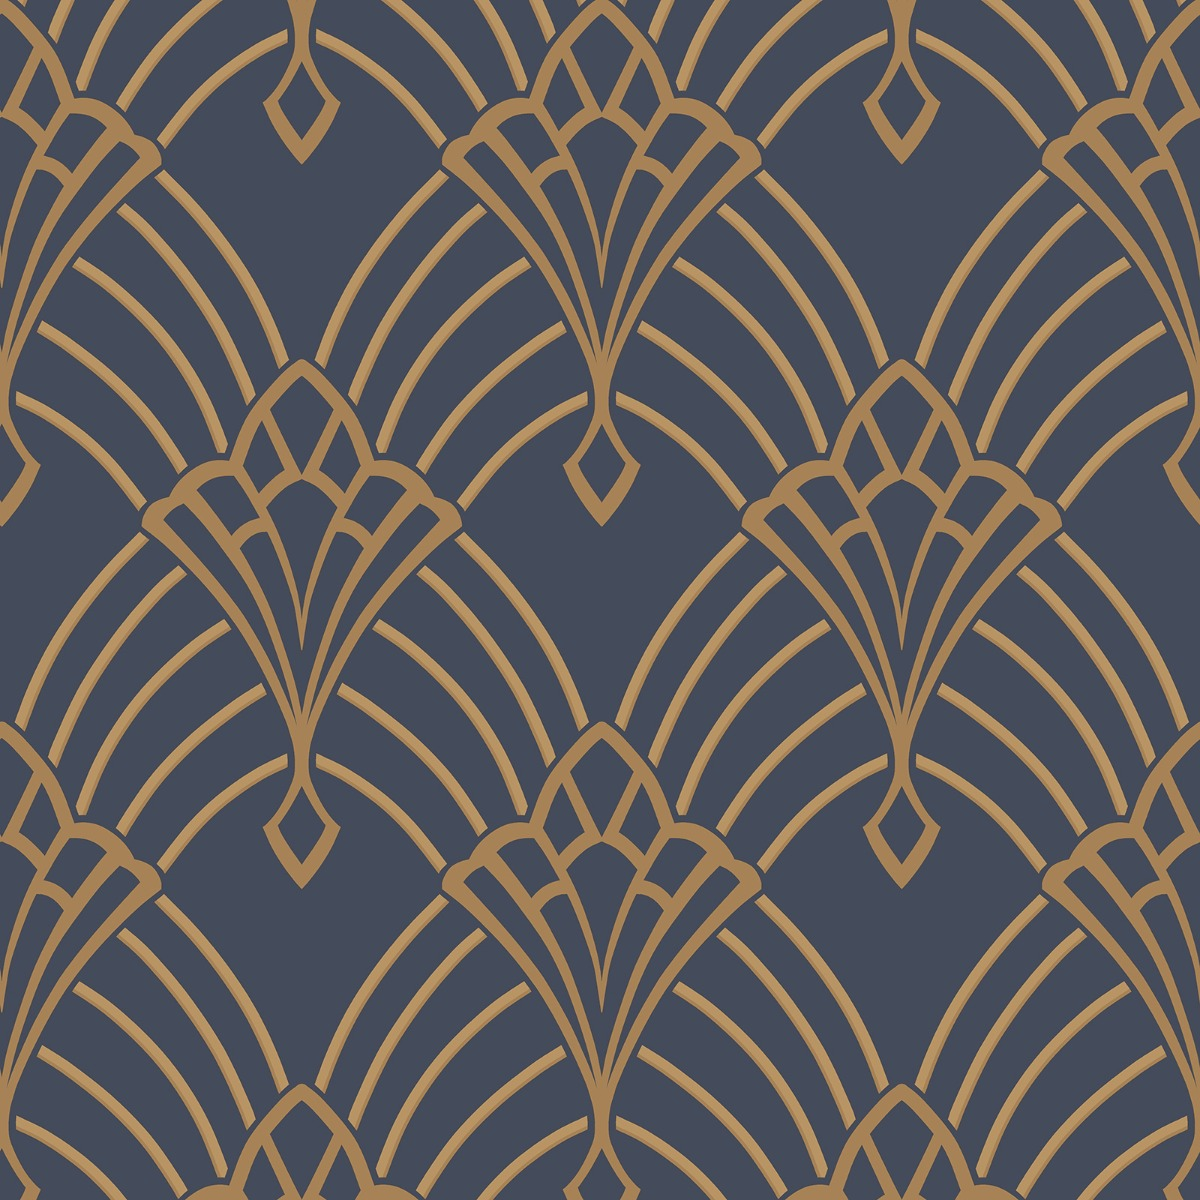 Astoria Deco Wallpaper Dark Blue and Gold Rasch